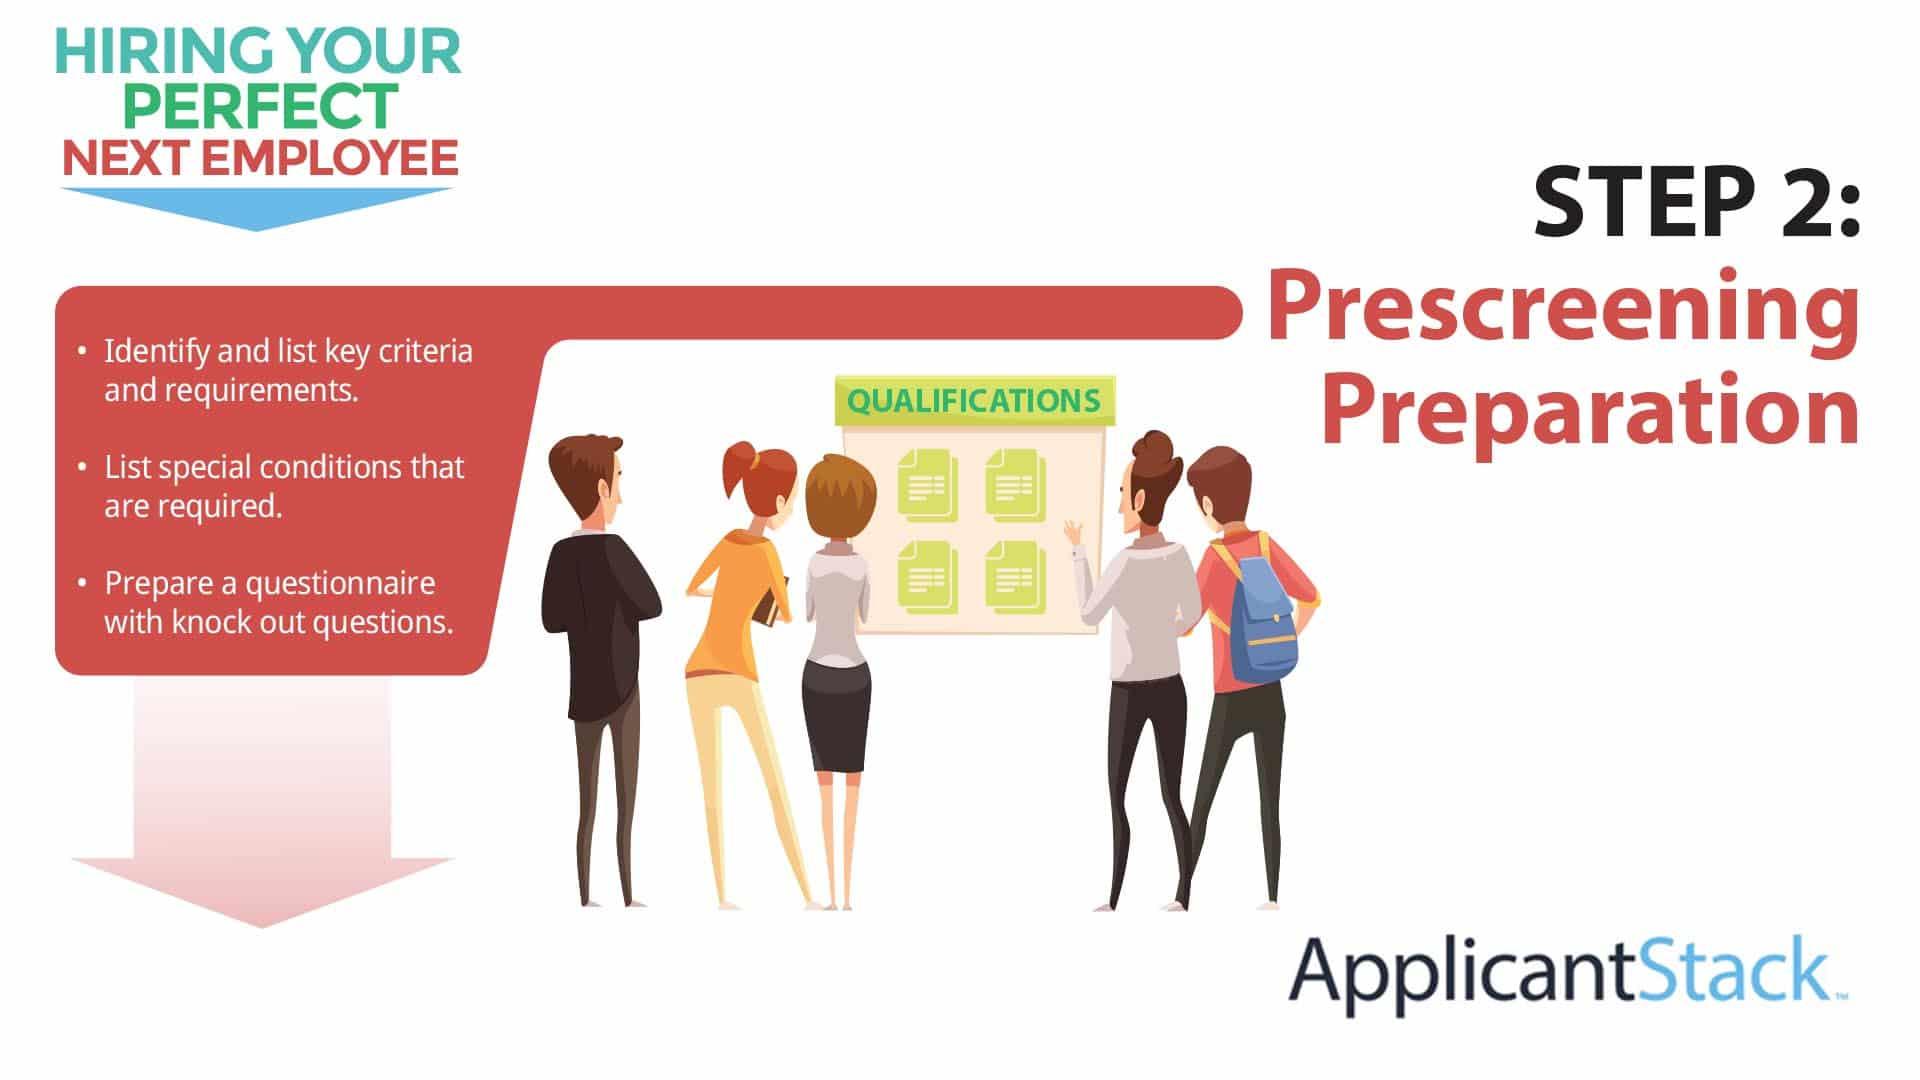 Prescreening Preparation